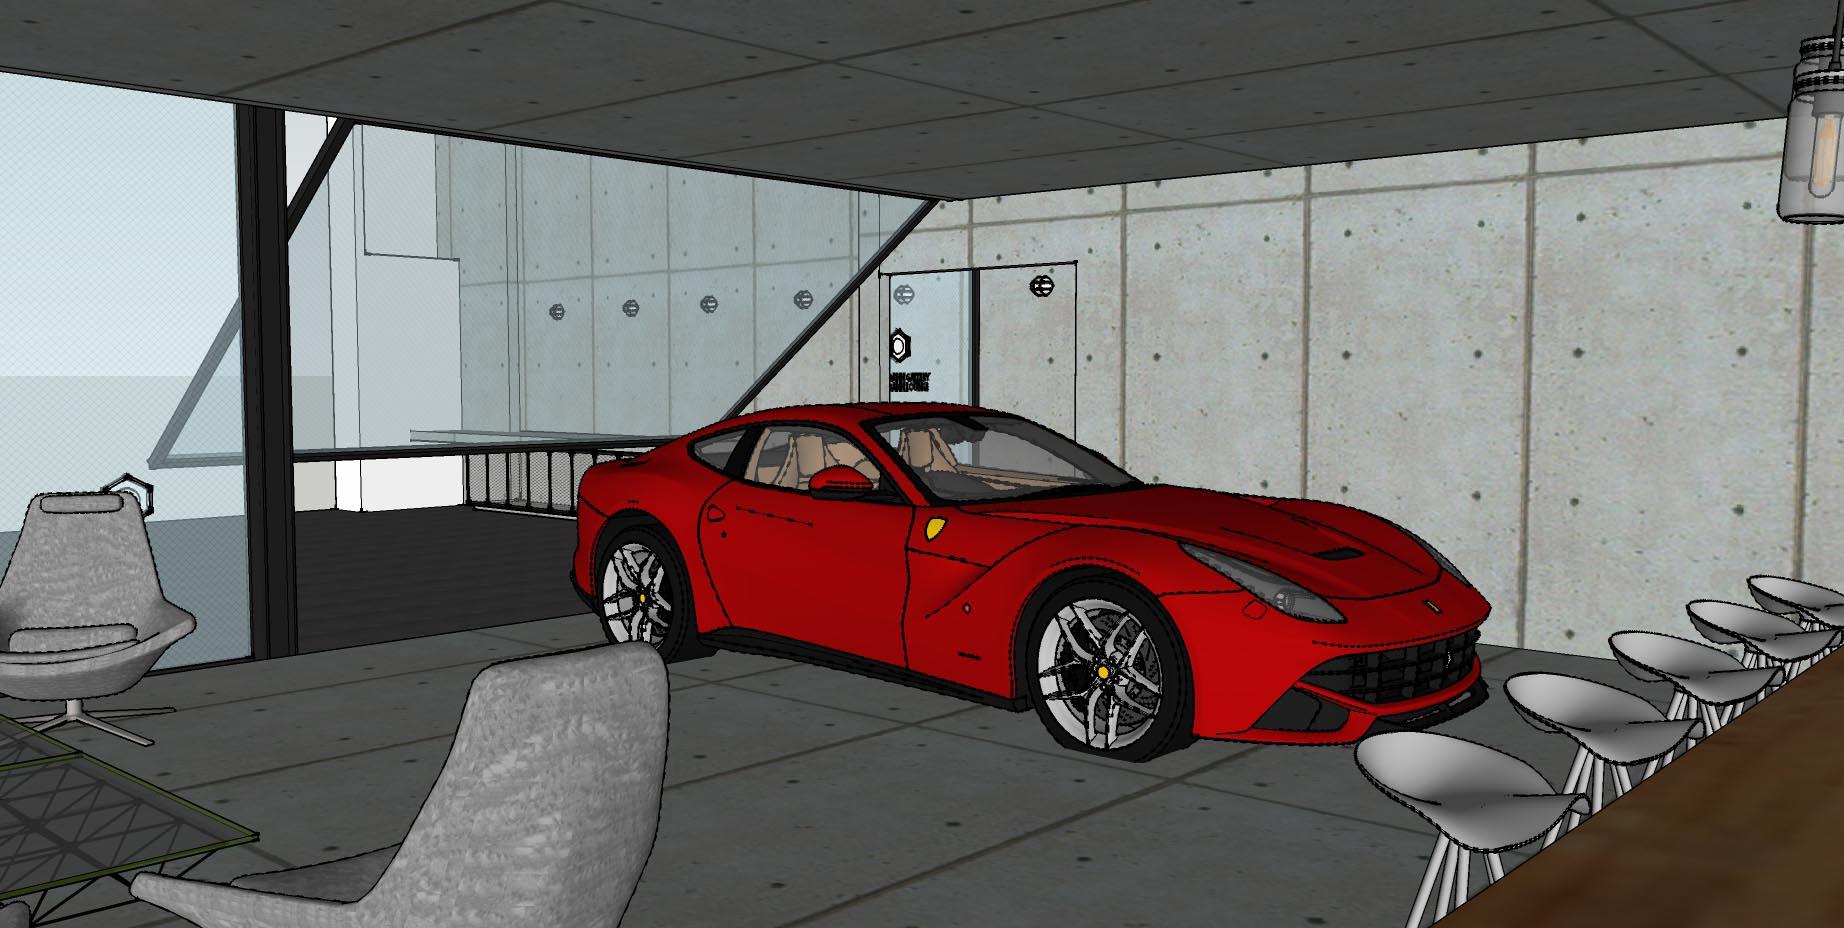 007 IV